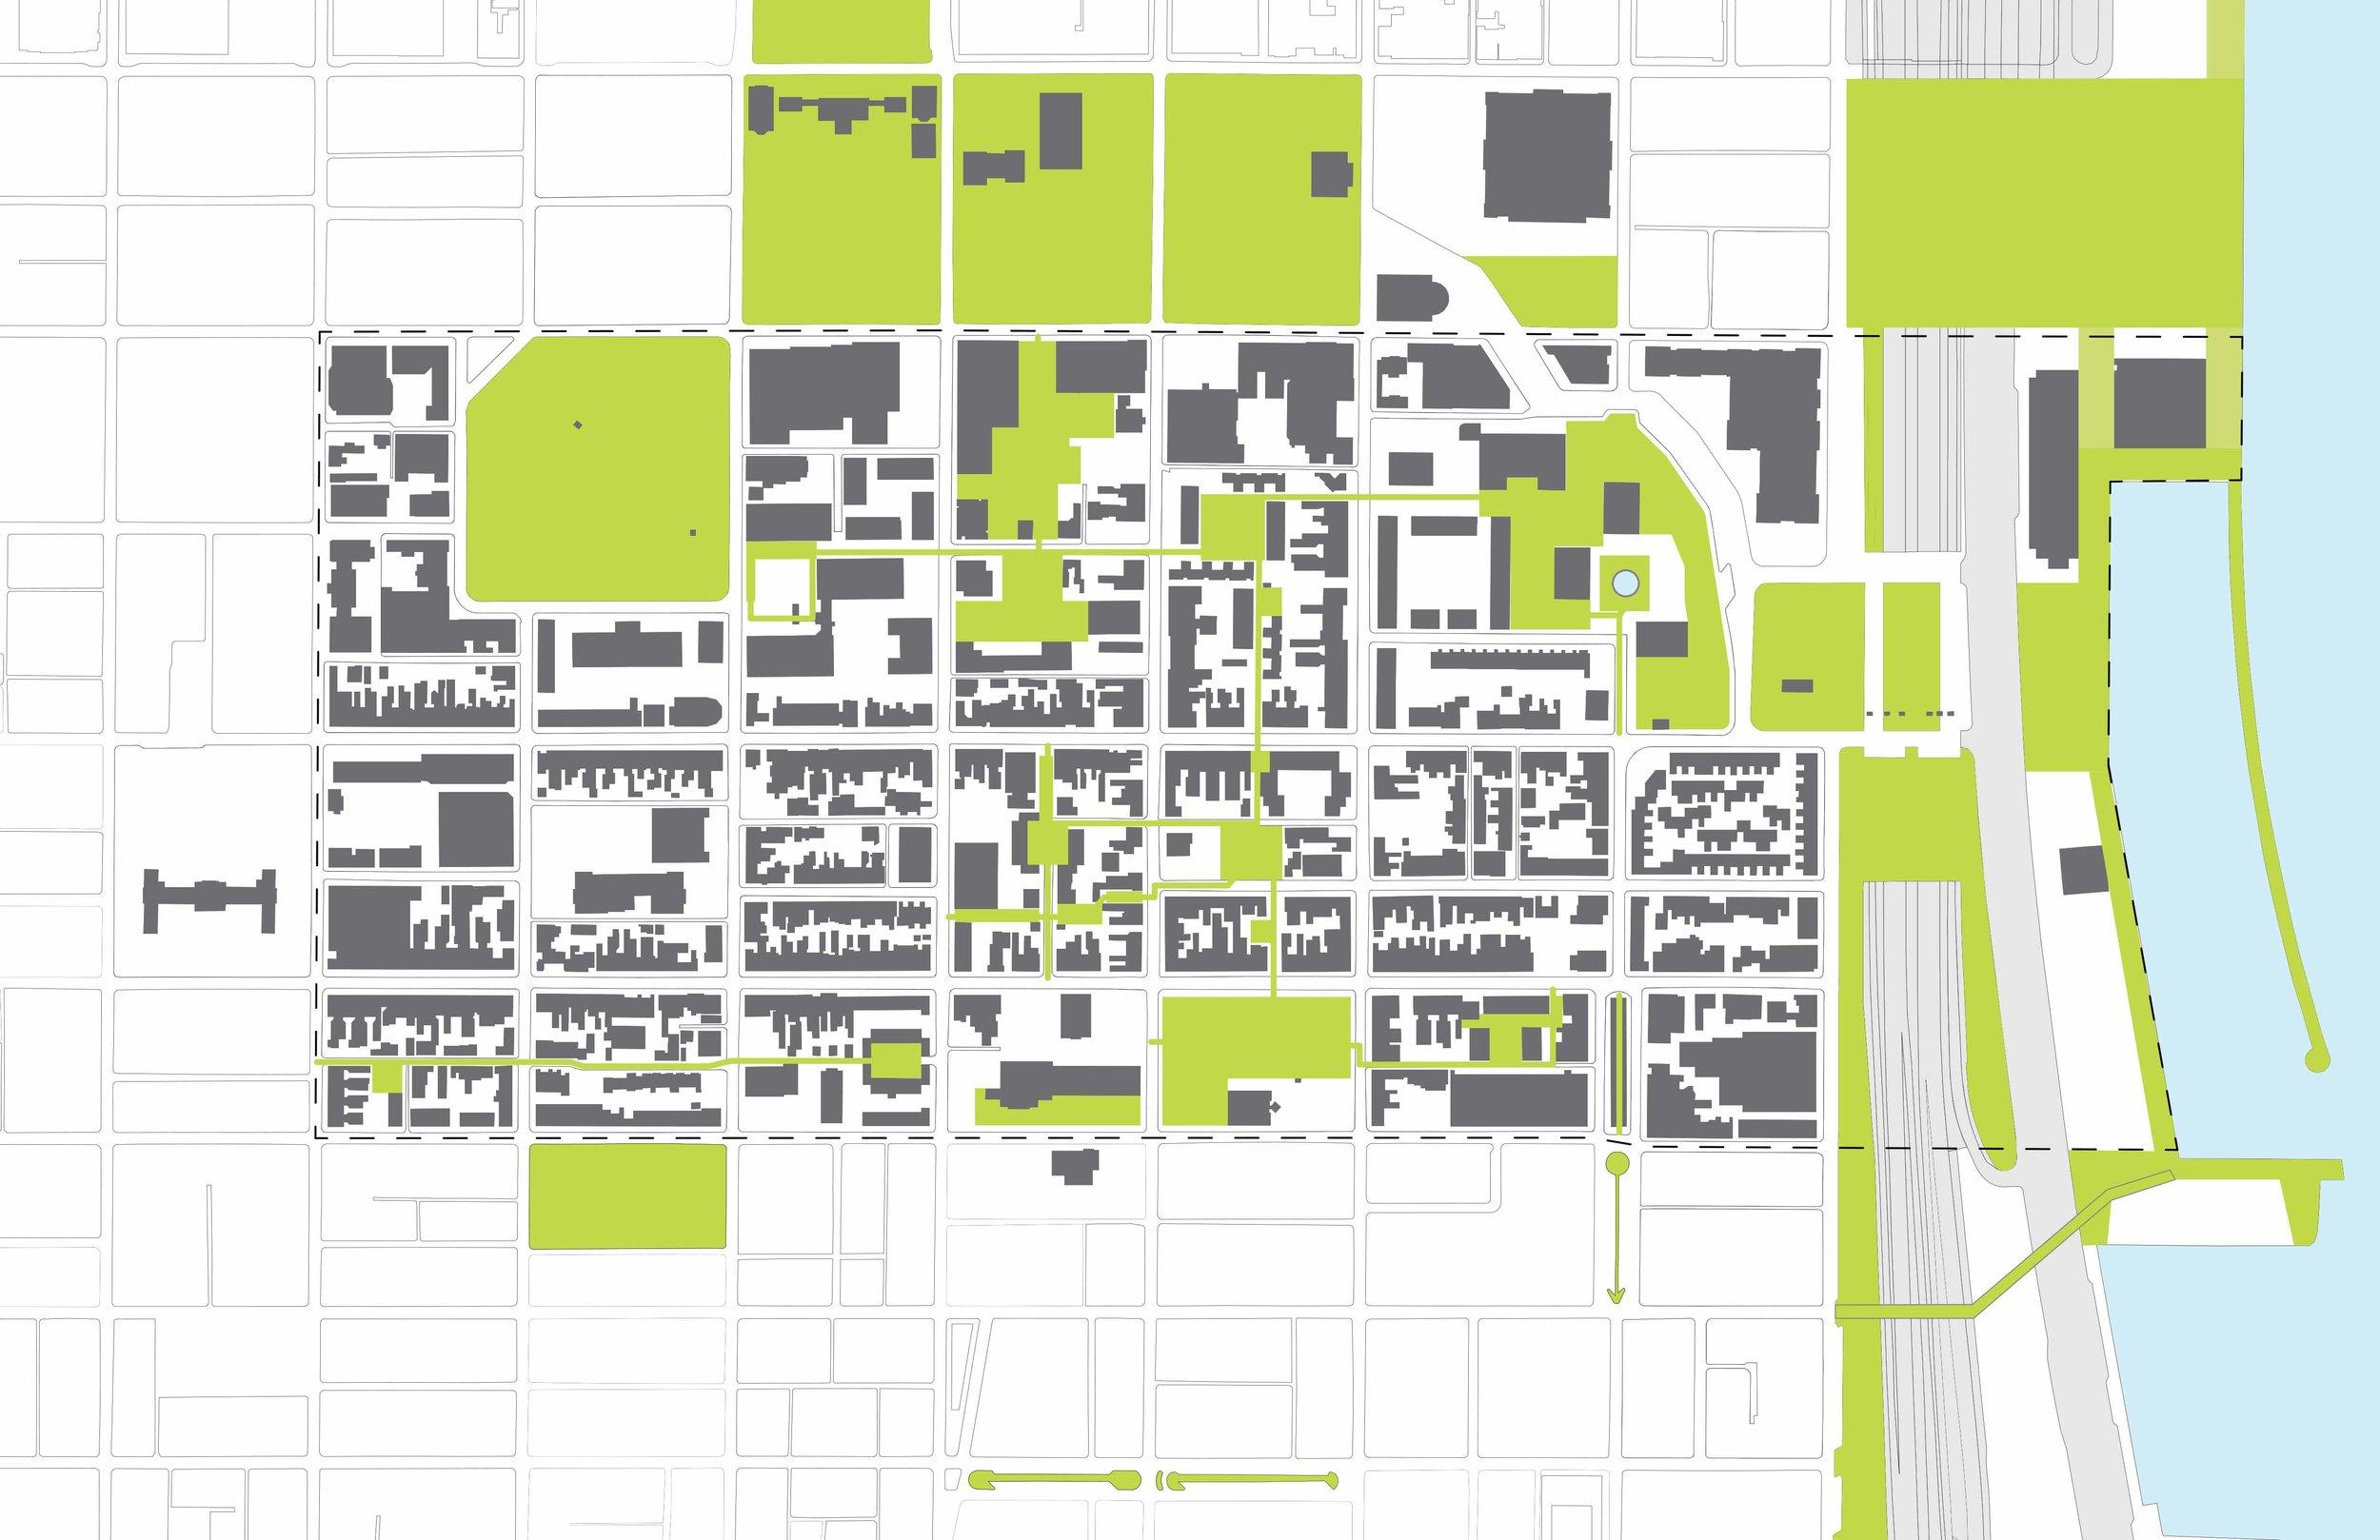 Existing Urban Fabric